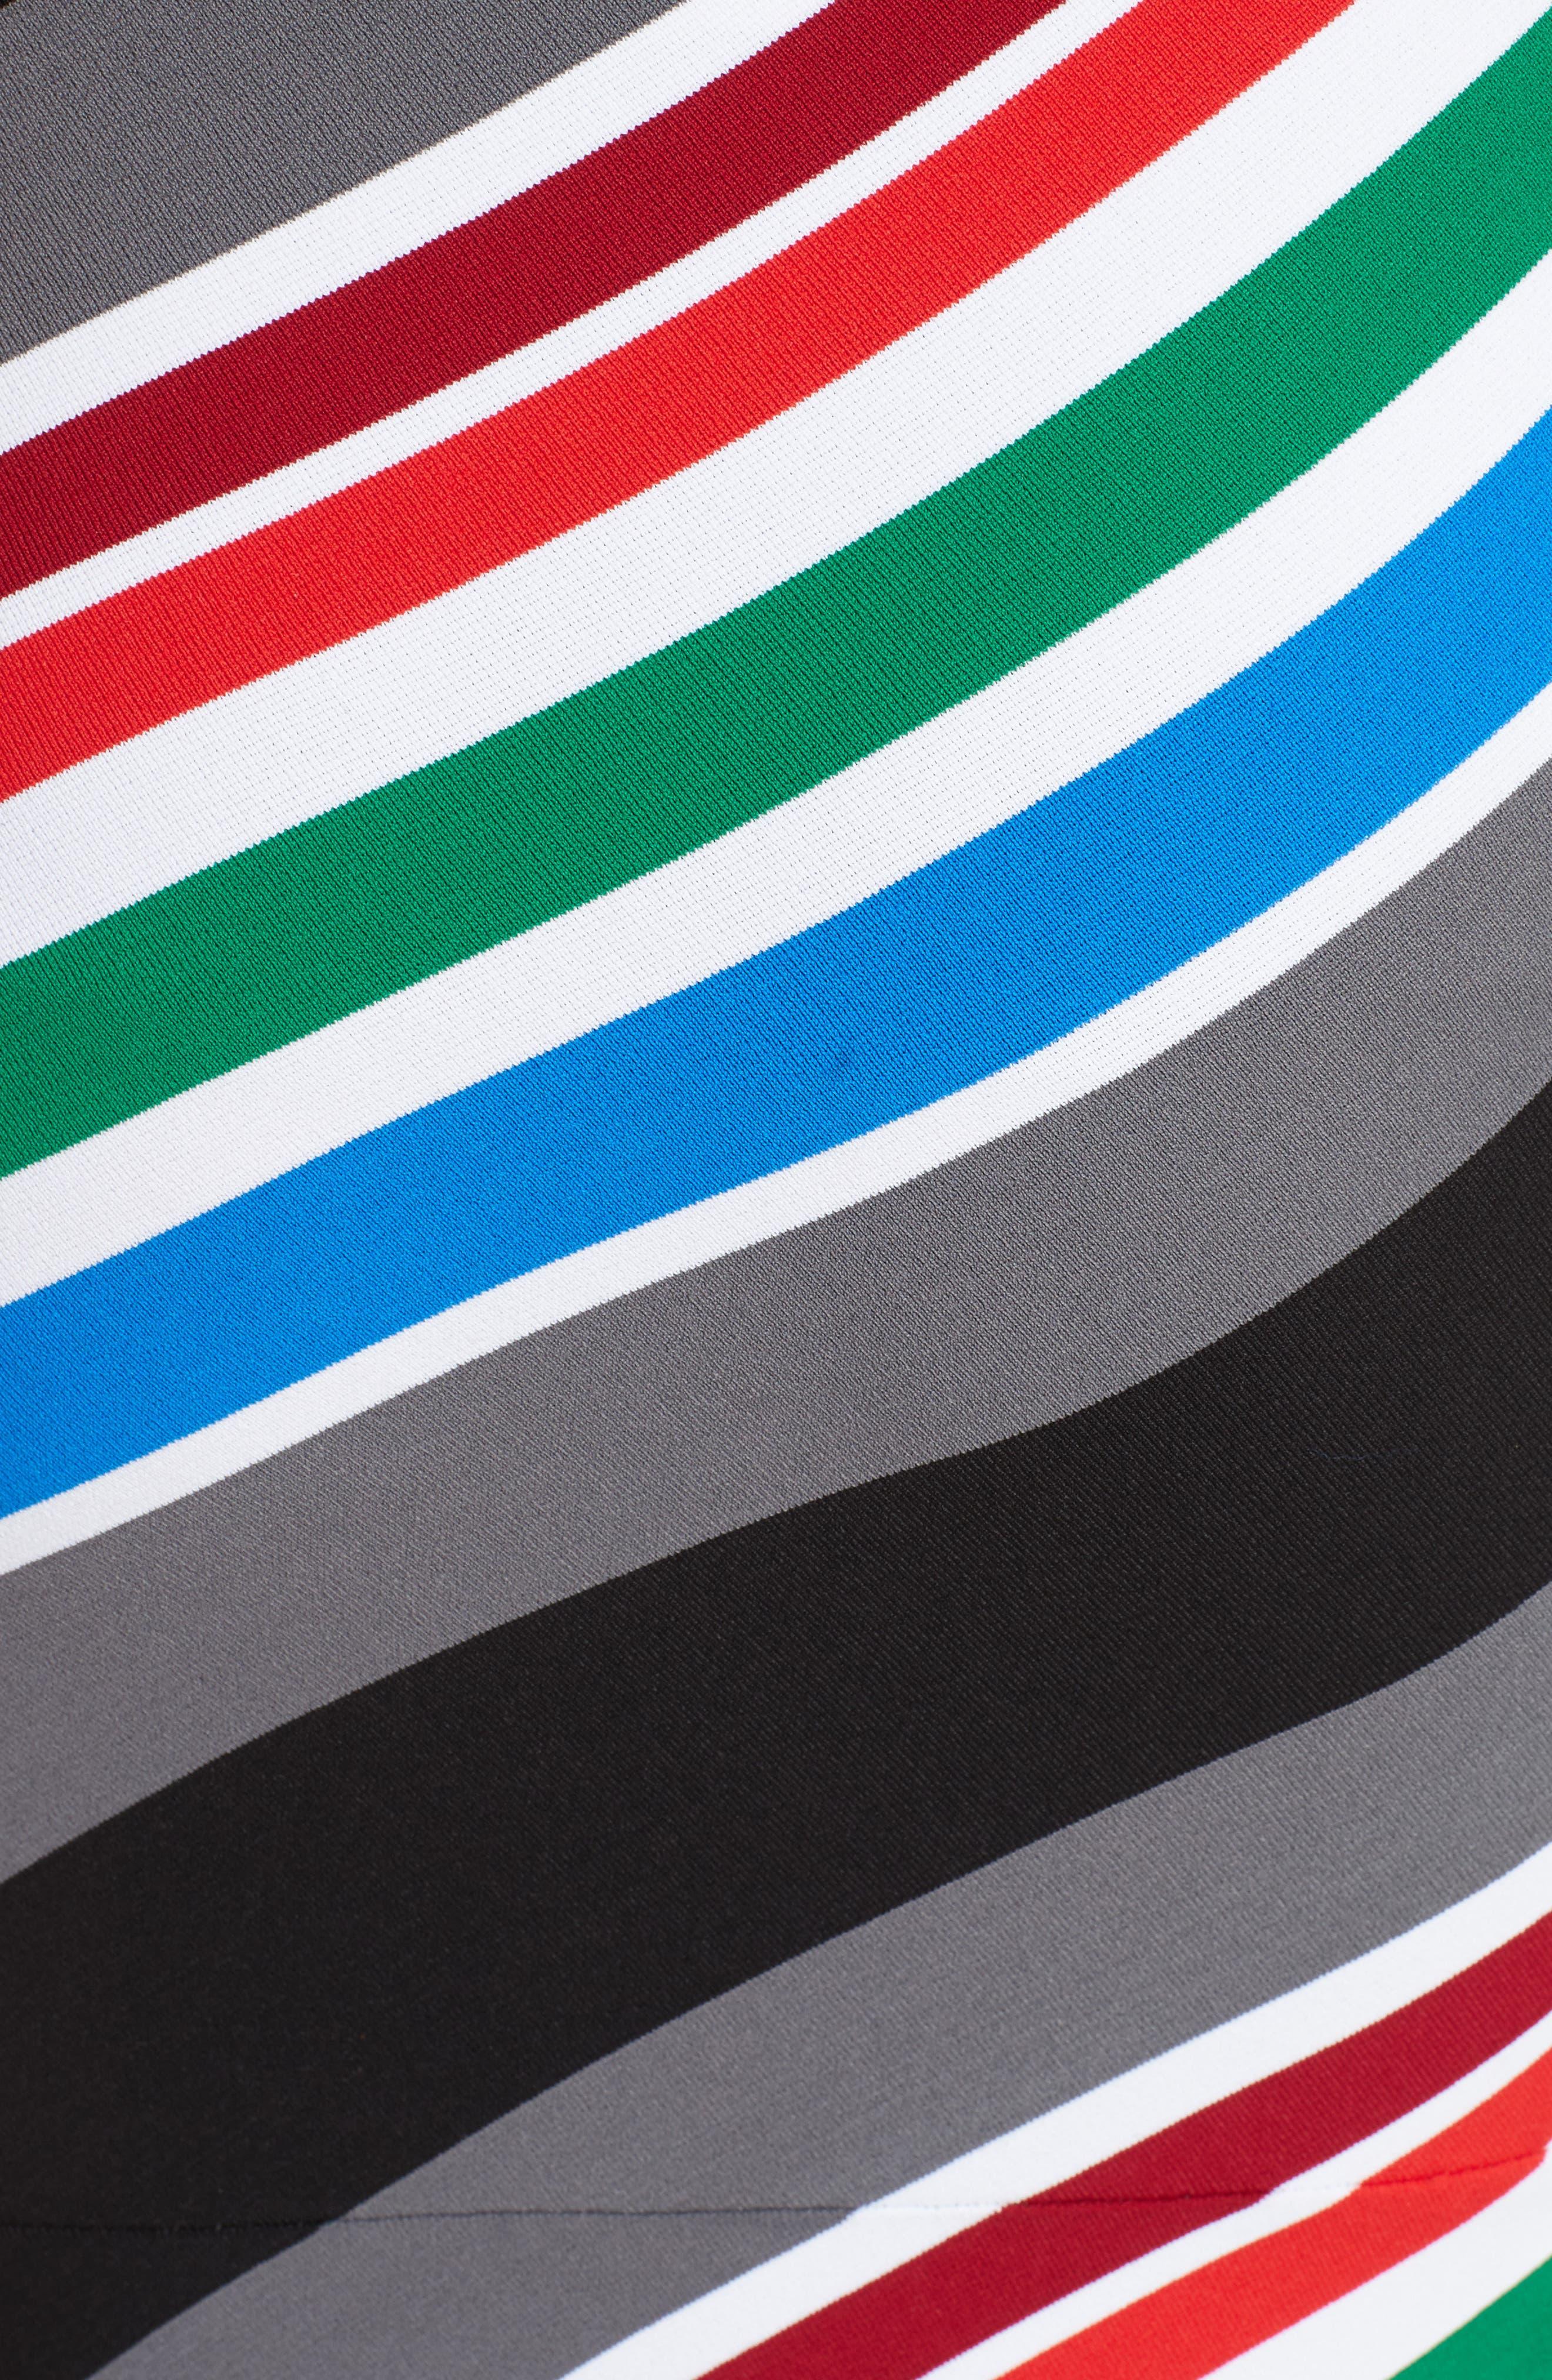 Compact Knit Stripe Skirt,                             Alternate thumbnail 5, color,                             960